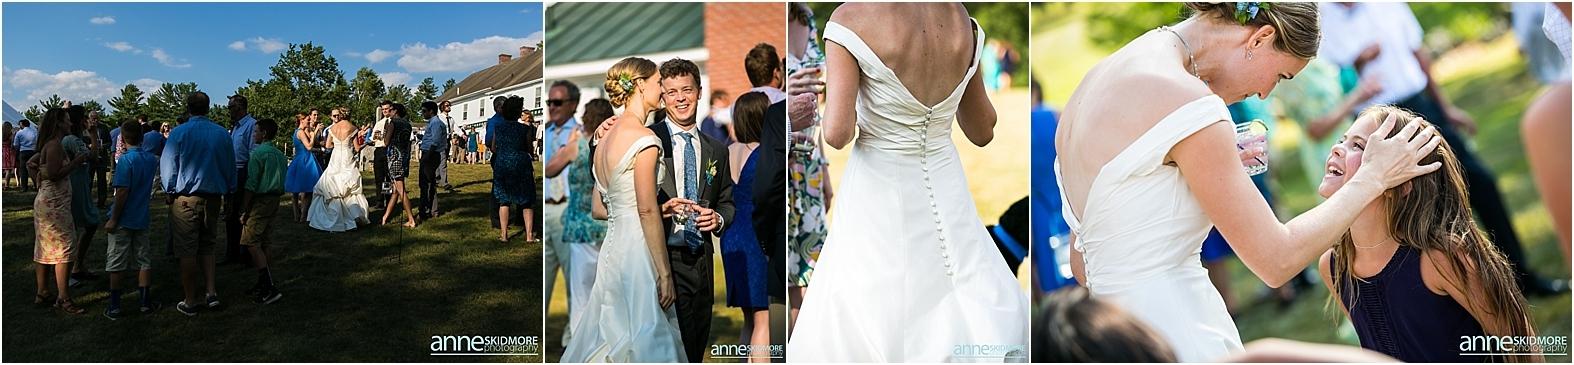 new_hampshire_wedding_photography_0053